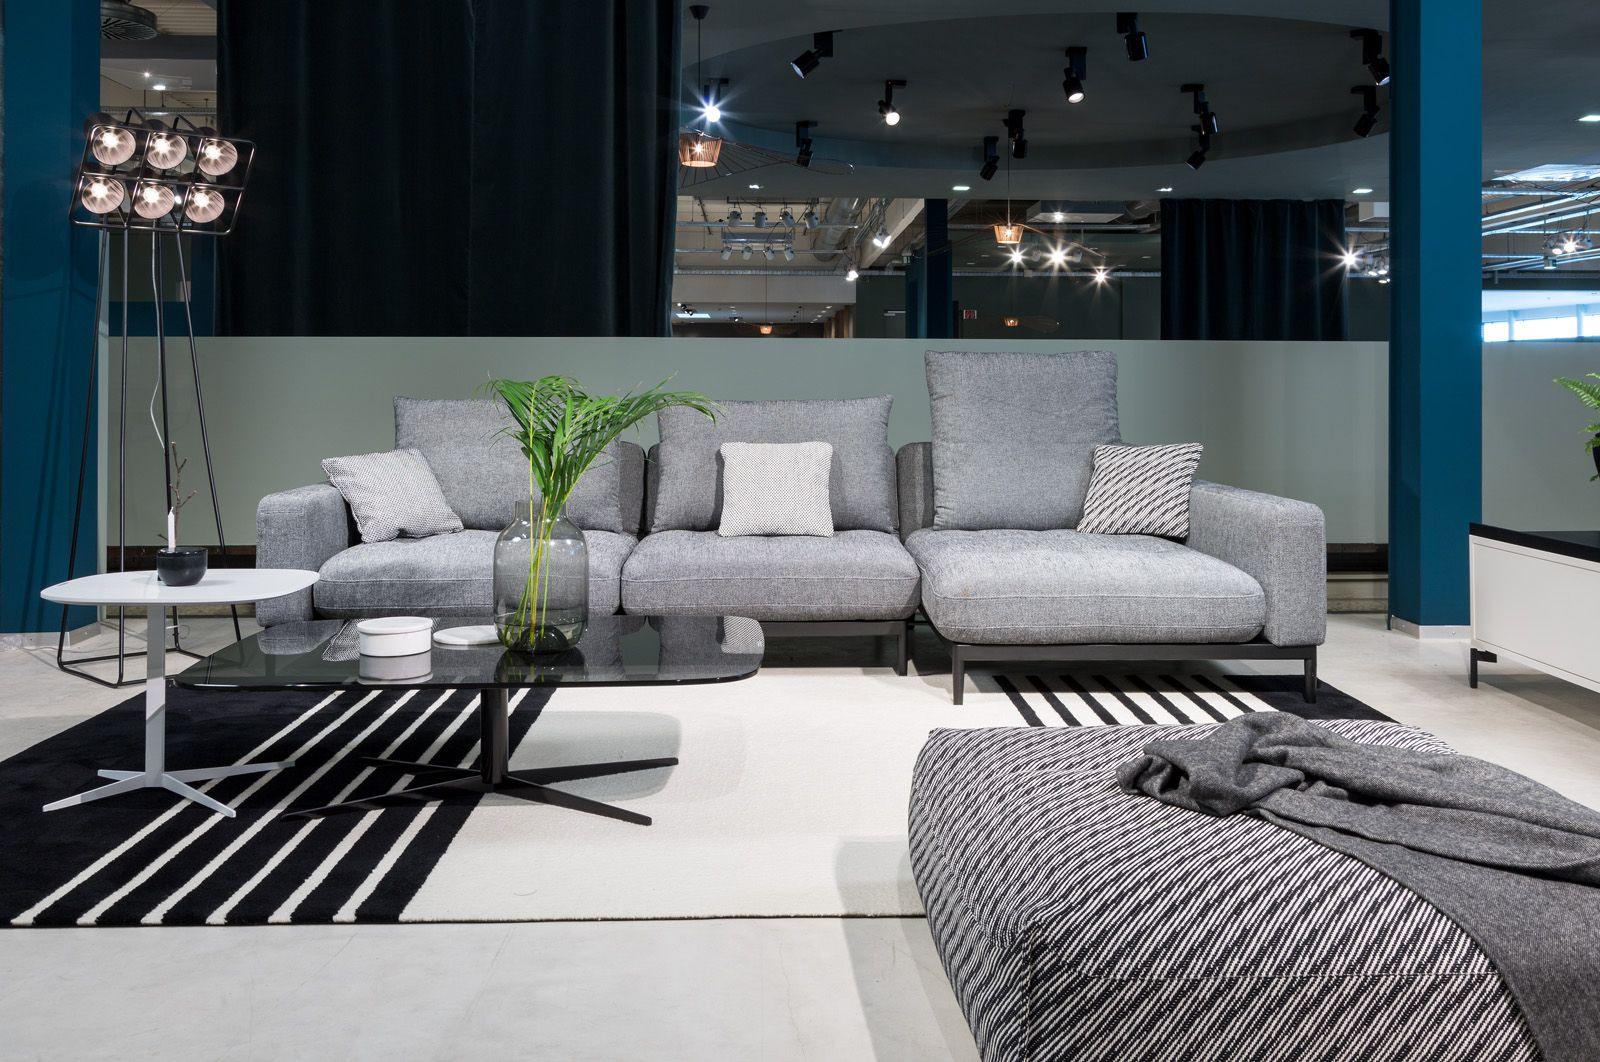 studio anise rolf benz 50 sofa. Fine Sofa Studio Anise Rolf Benz 50 Sofa Tira Sectional  Sofa B Throughout Studio Anise Rolf Benz Sofa A